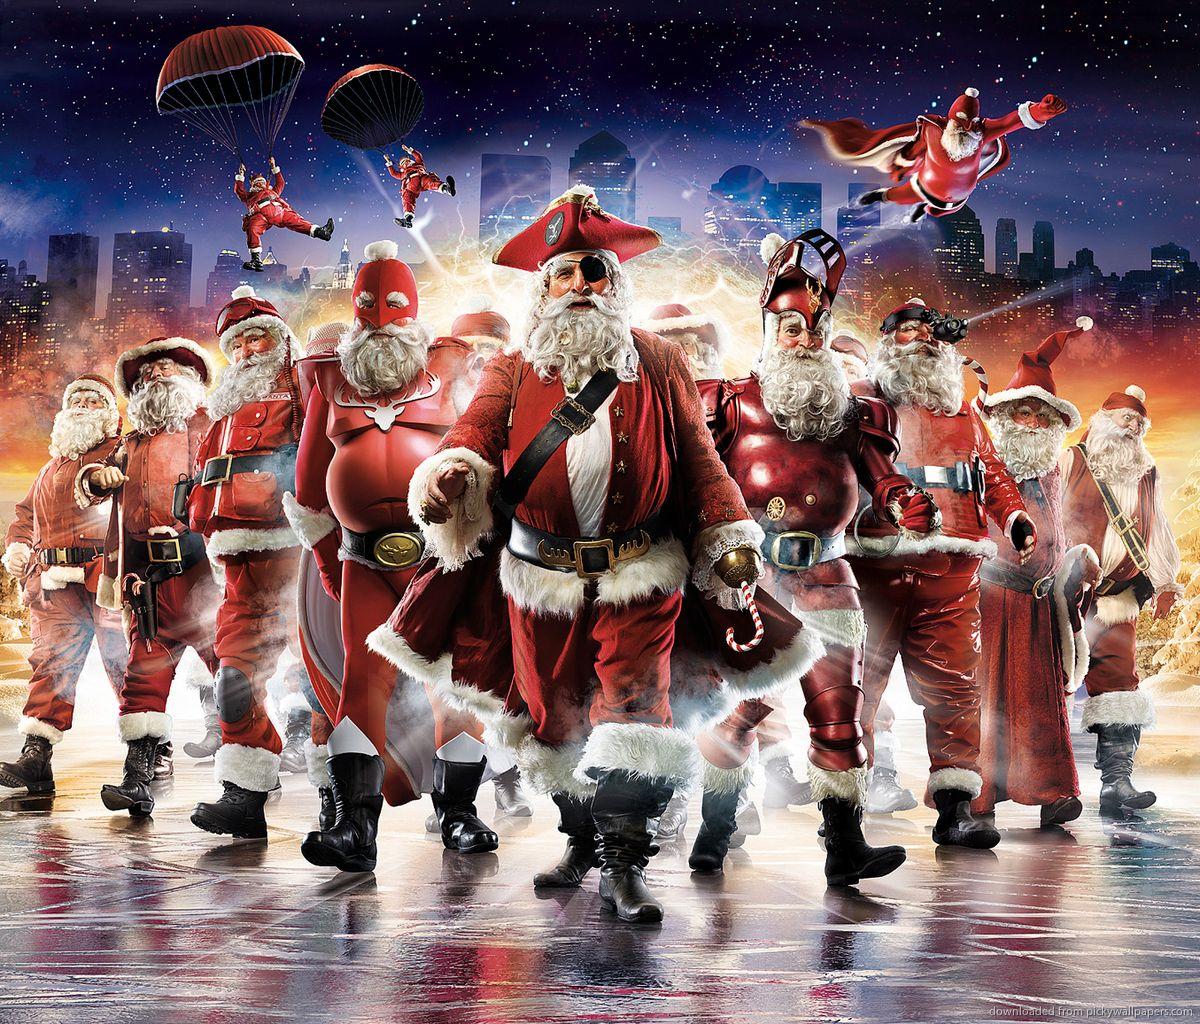 Superhero Santa Santa claus wallpaper, Merry christmas